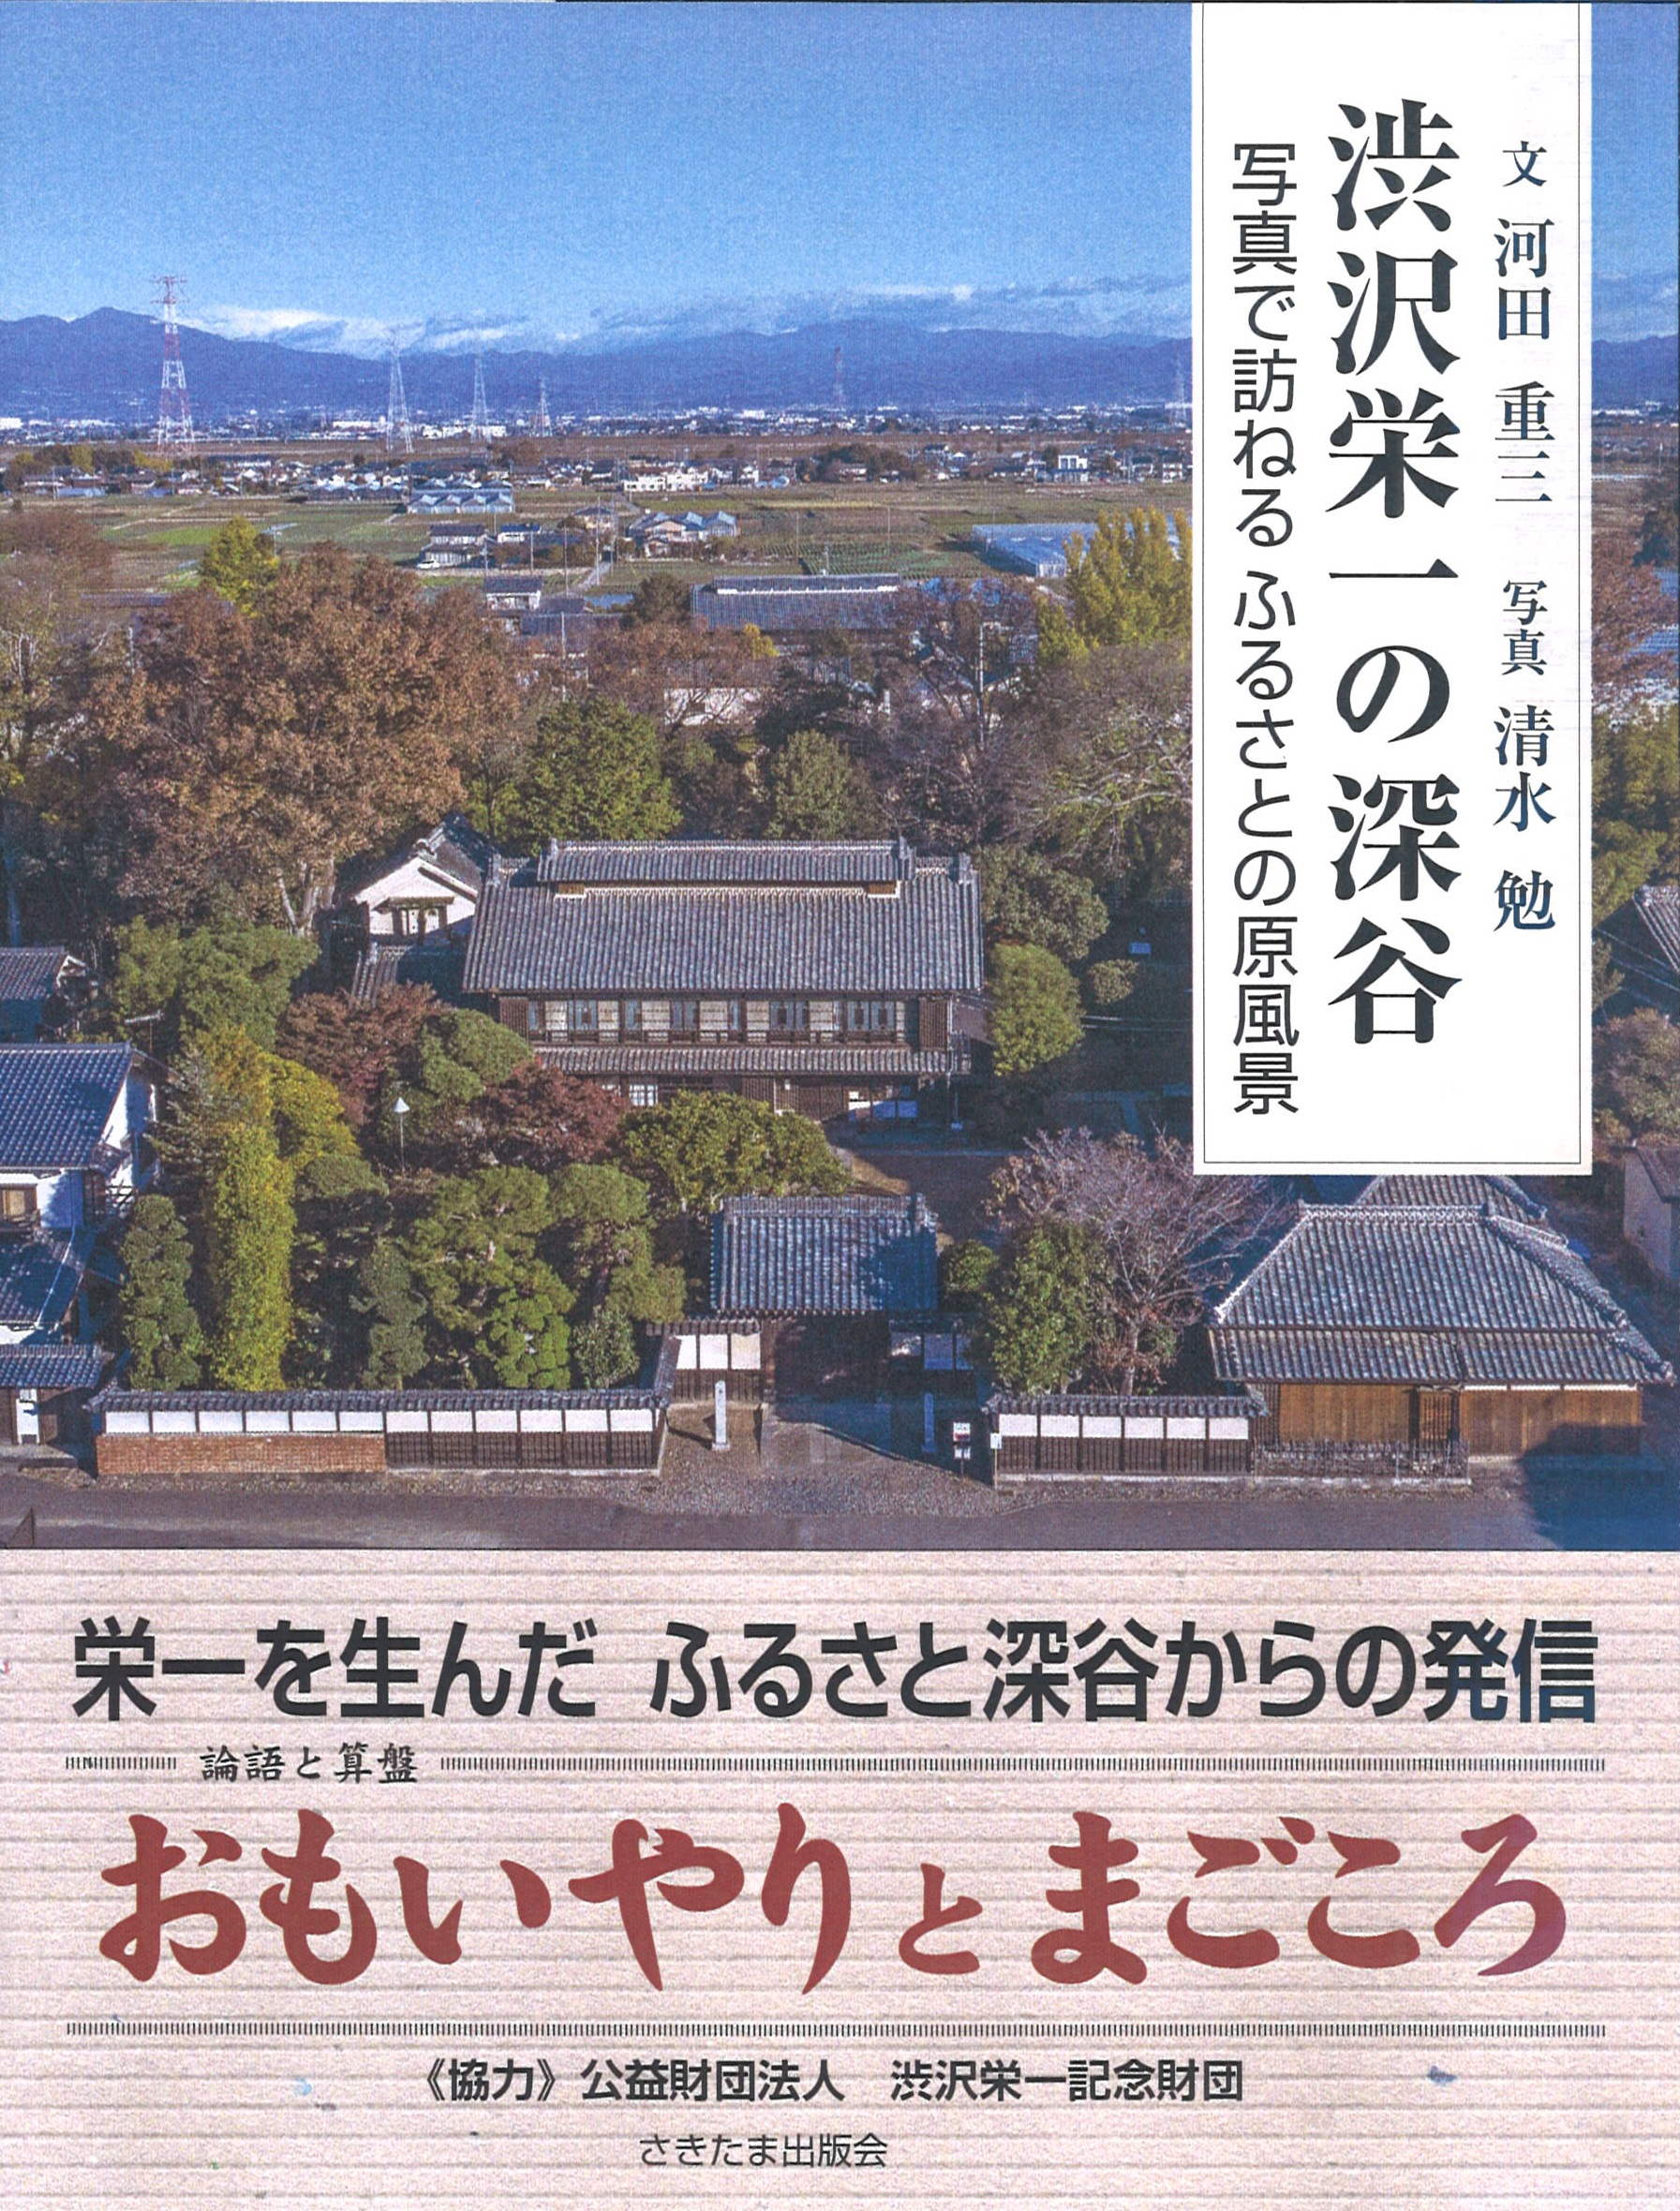 渋沢栄一の深谷